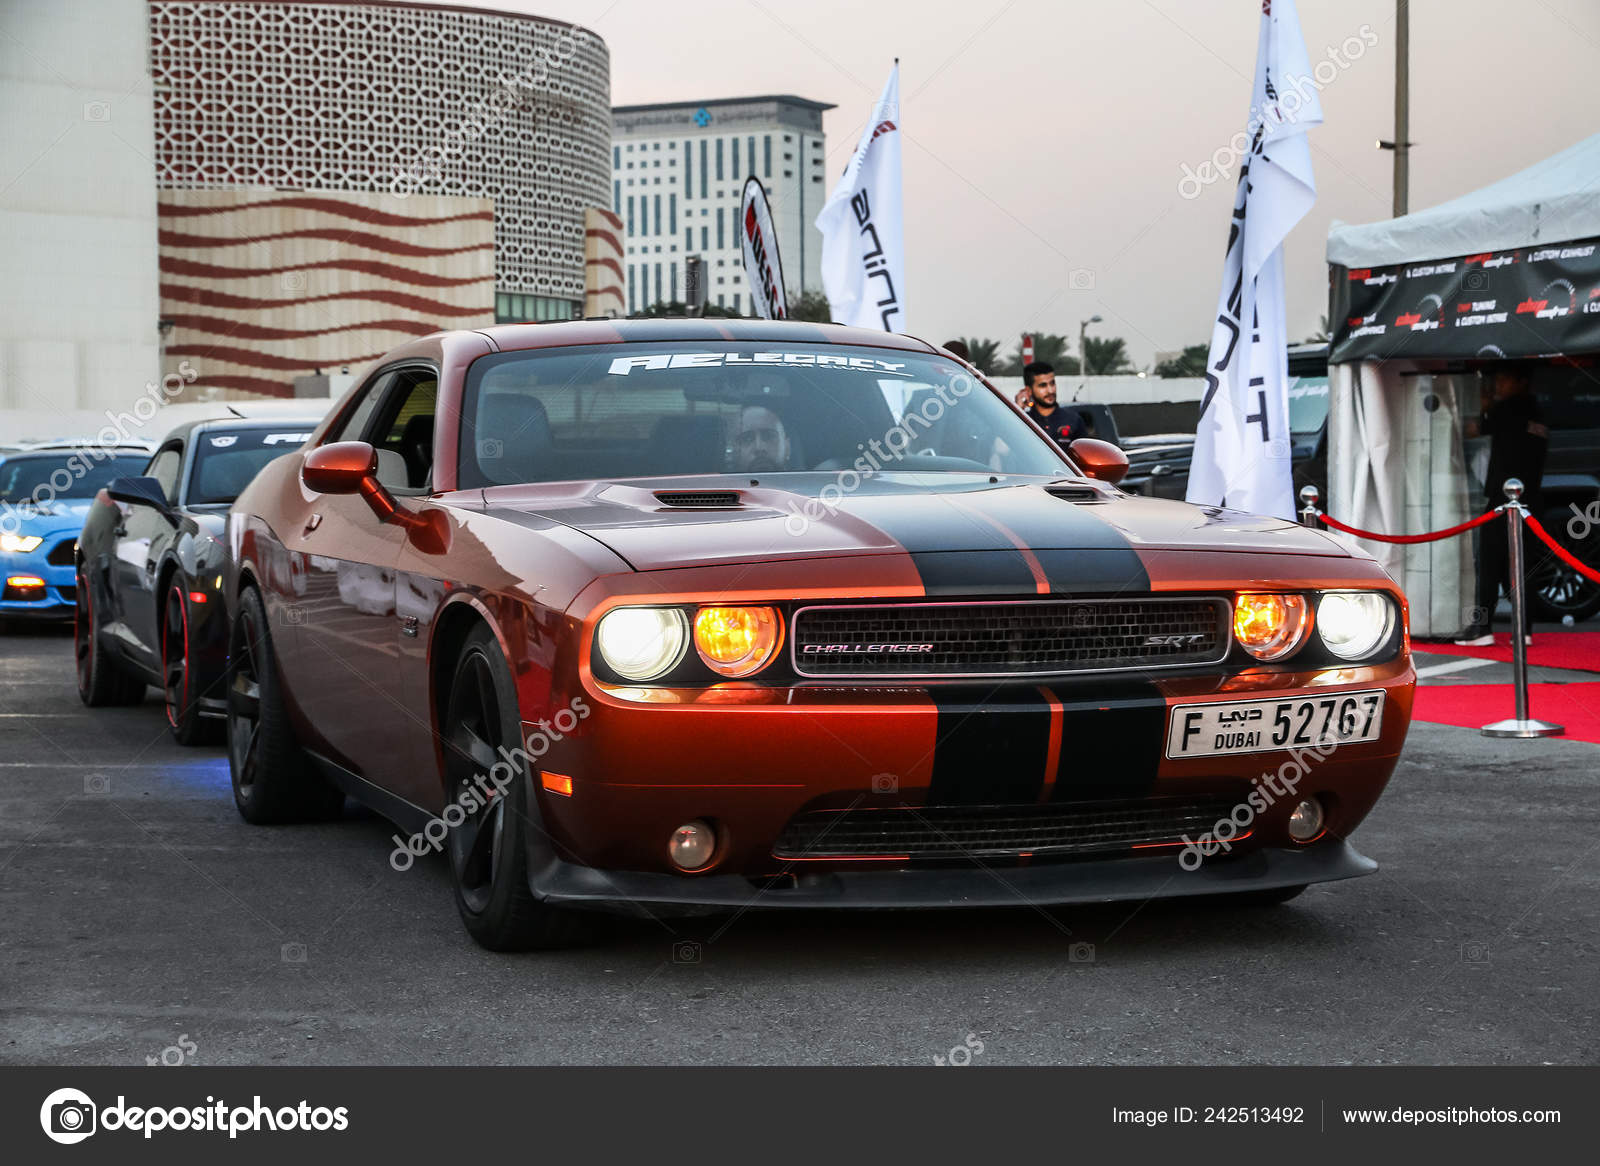 Dubai Uae November 2018 American Muscle Car Dodge Challenger Srt Stock Editorial Photo C Artzzz 242513492